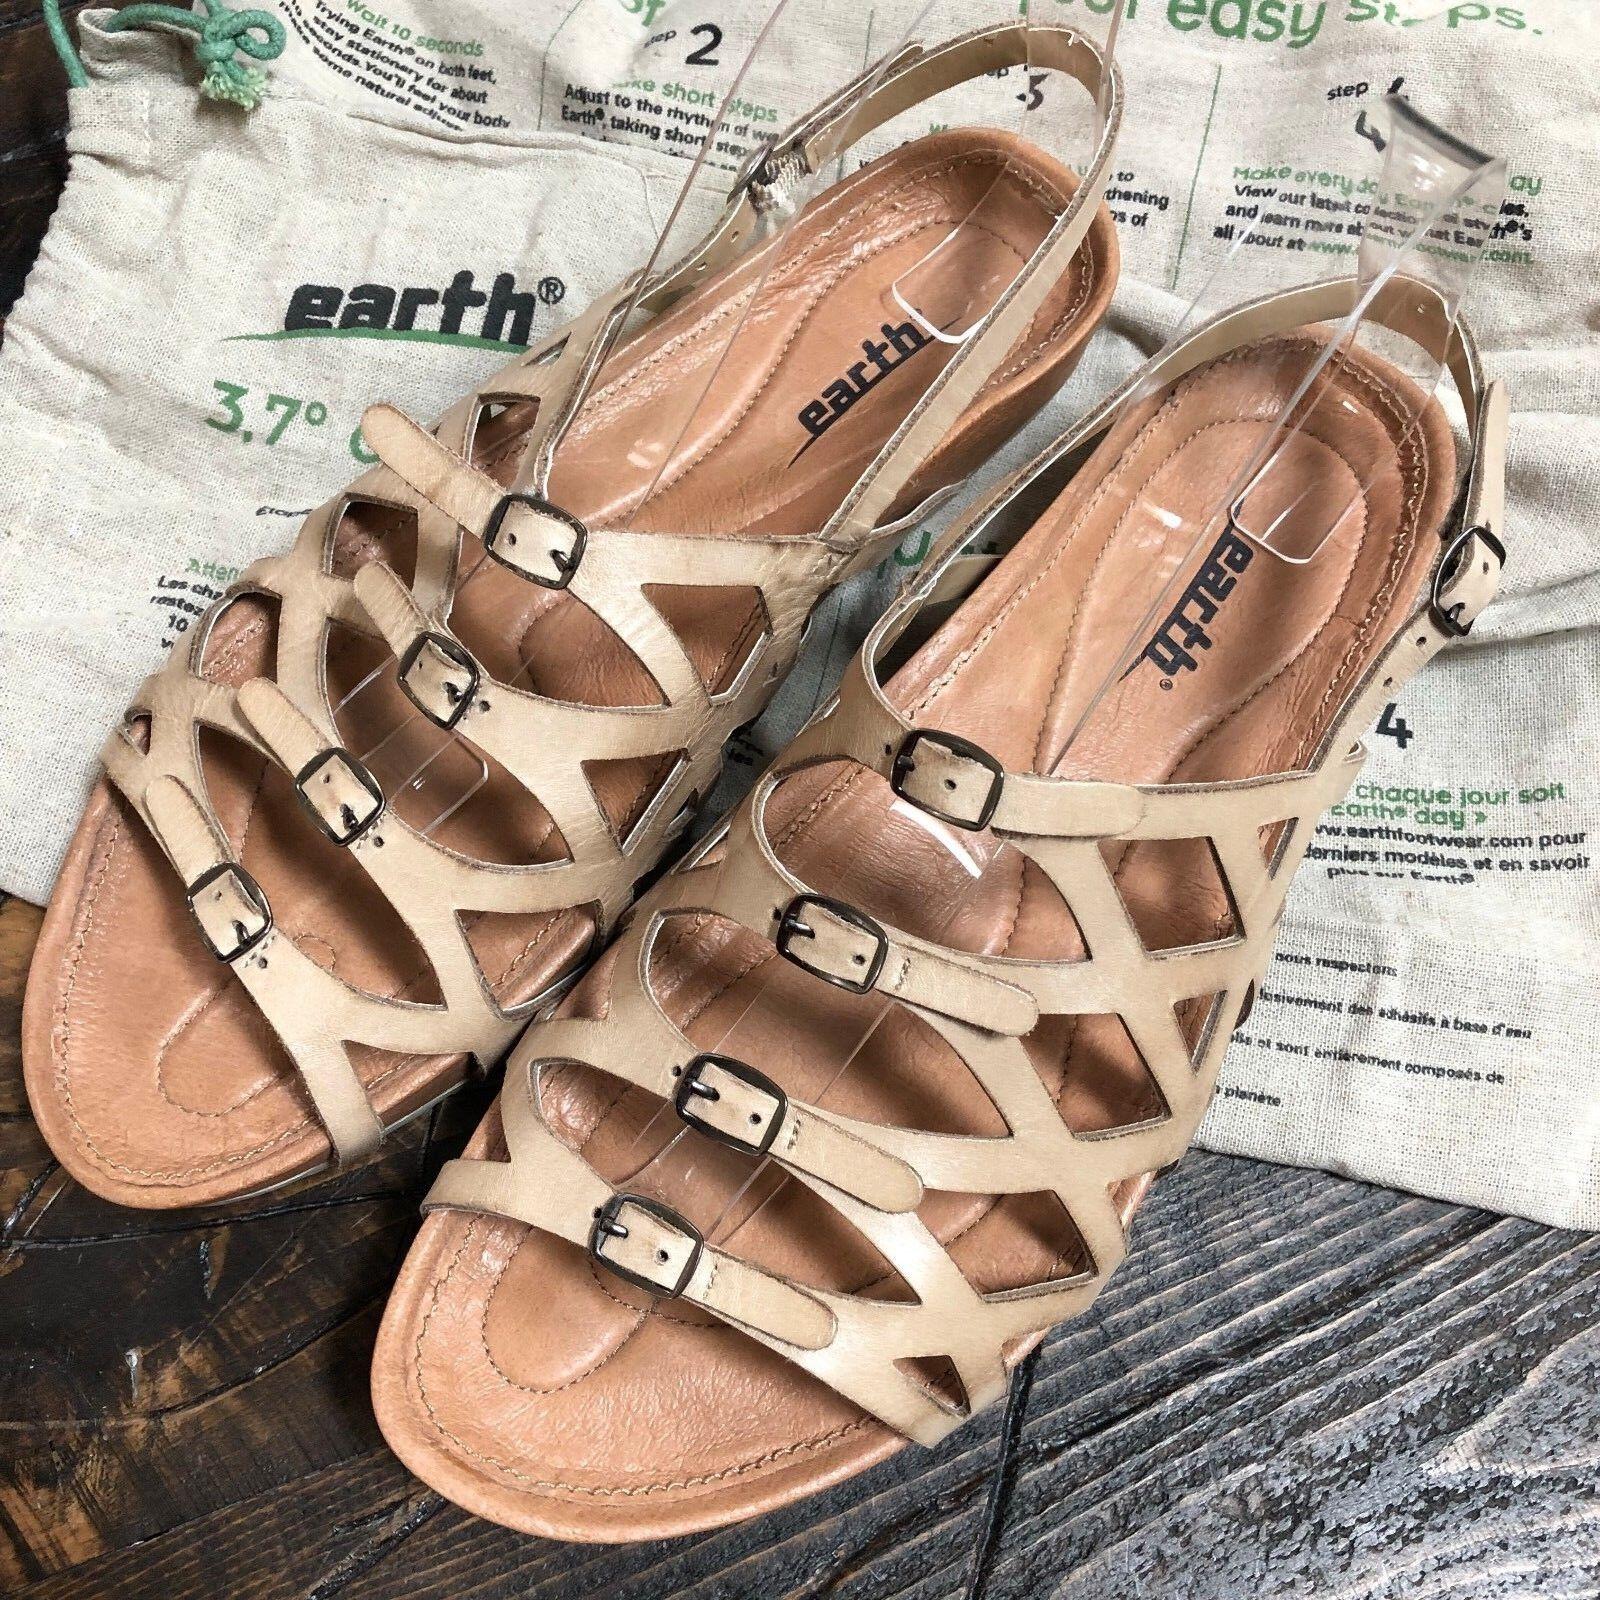 Earth 3.7  Elegant Biscuit Slingback Strappy Sandals Women's Sz 10 B